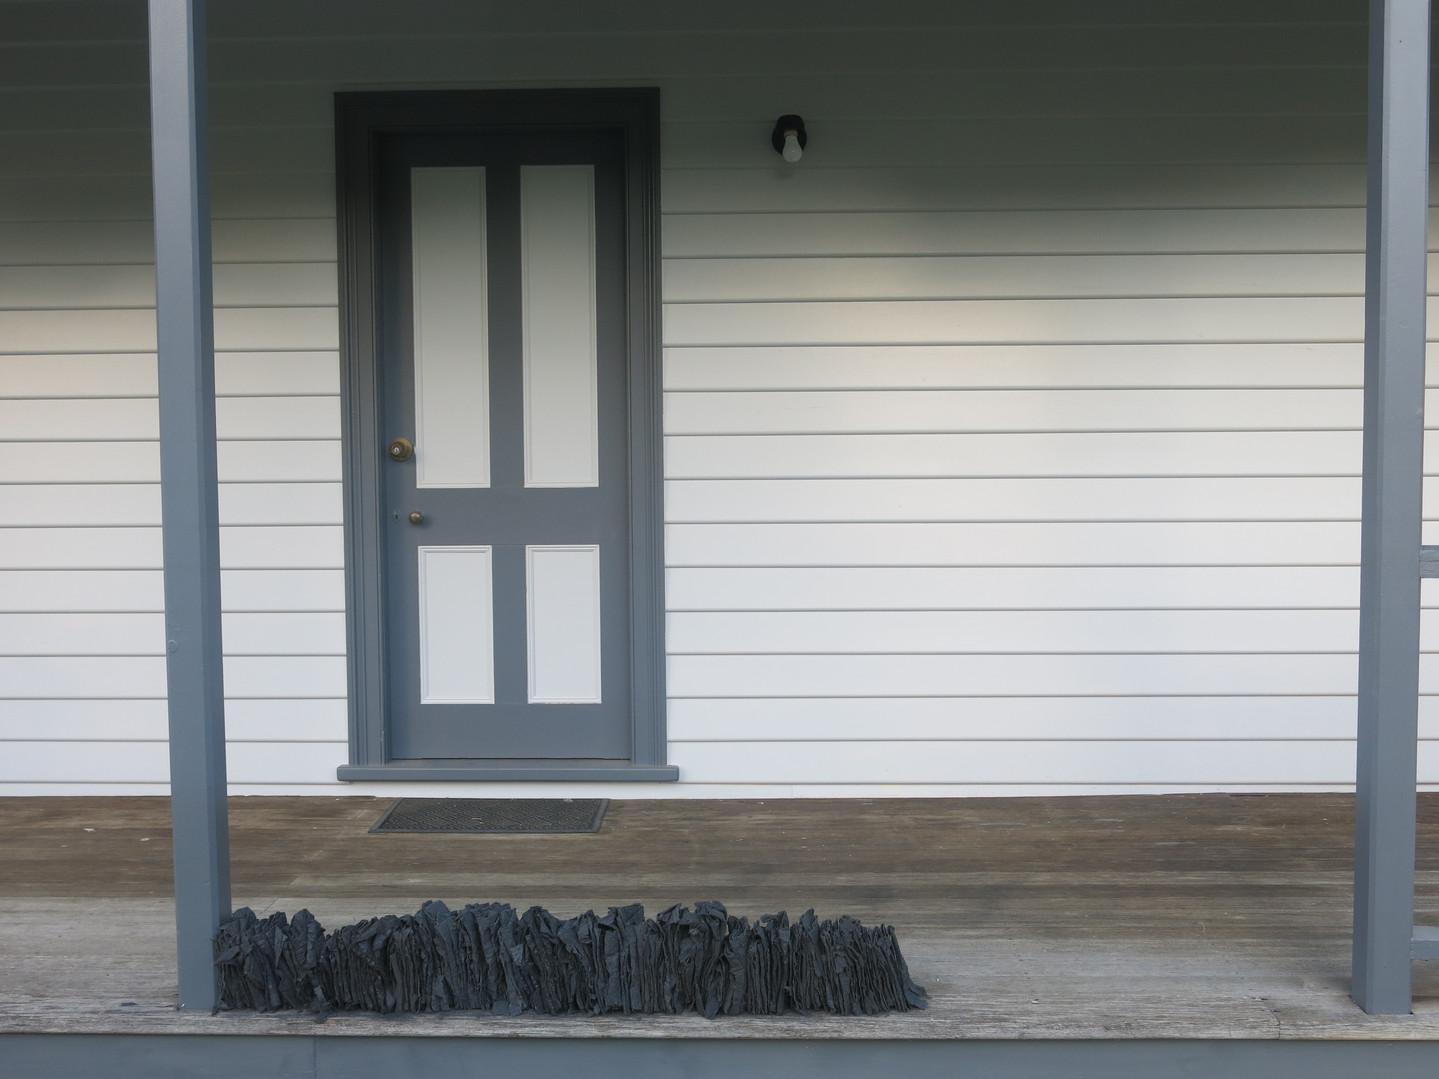 Half Post Verandah, 2018, Fabric, cement, clay & iron oxide installation, 120x25x15cm